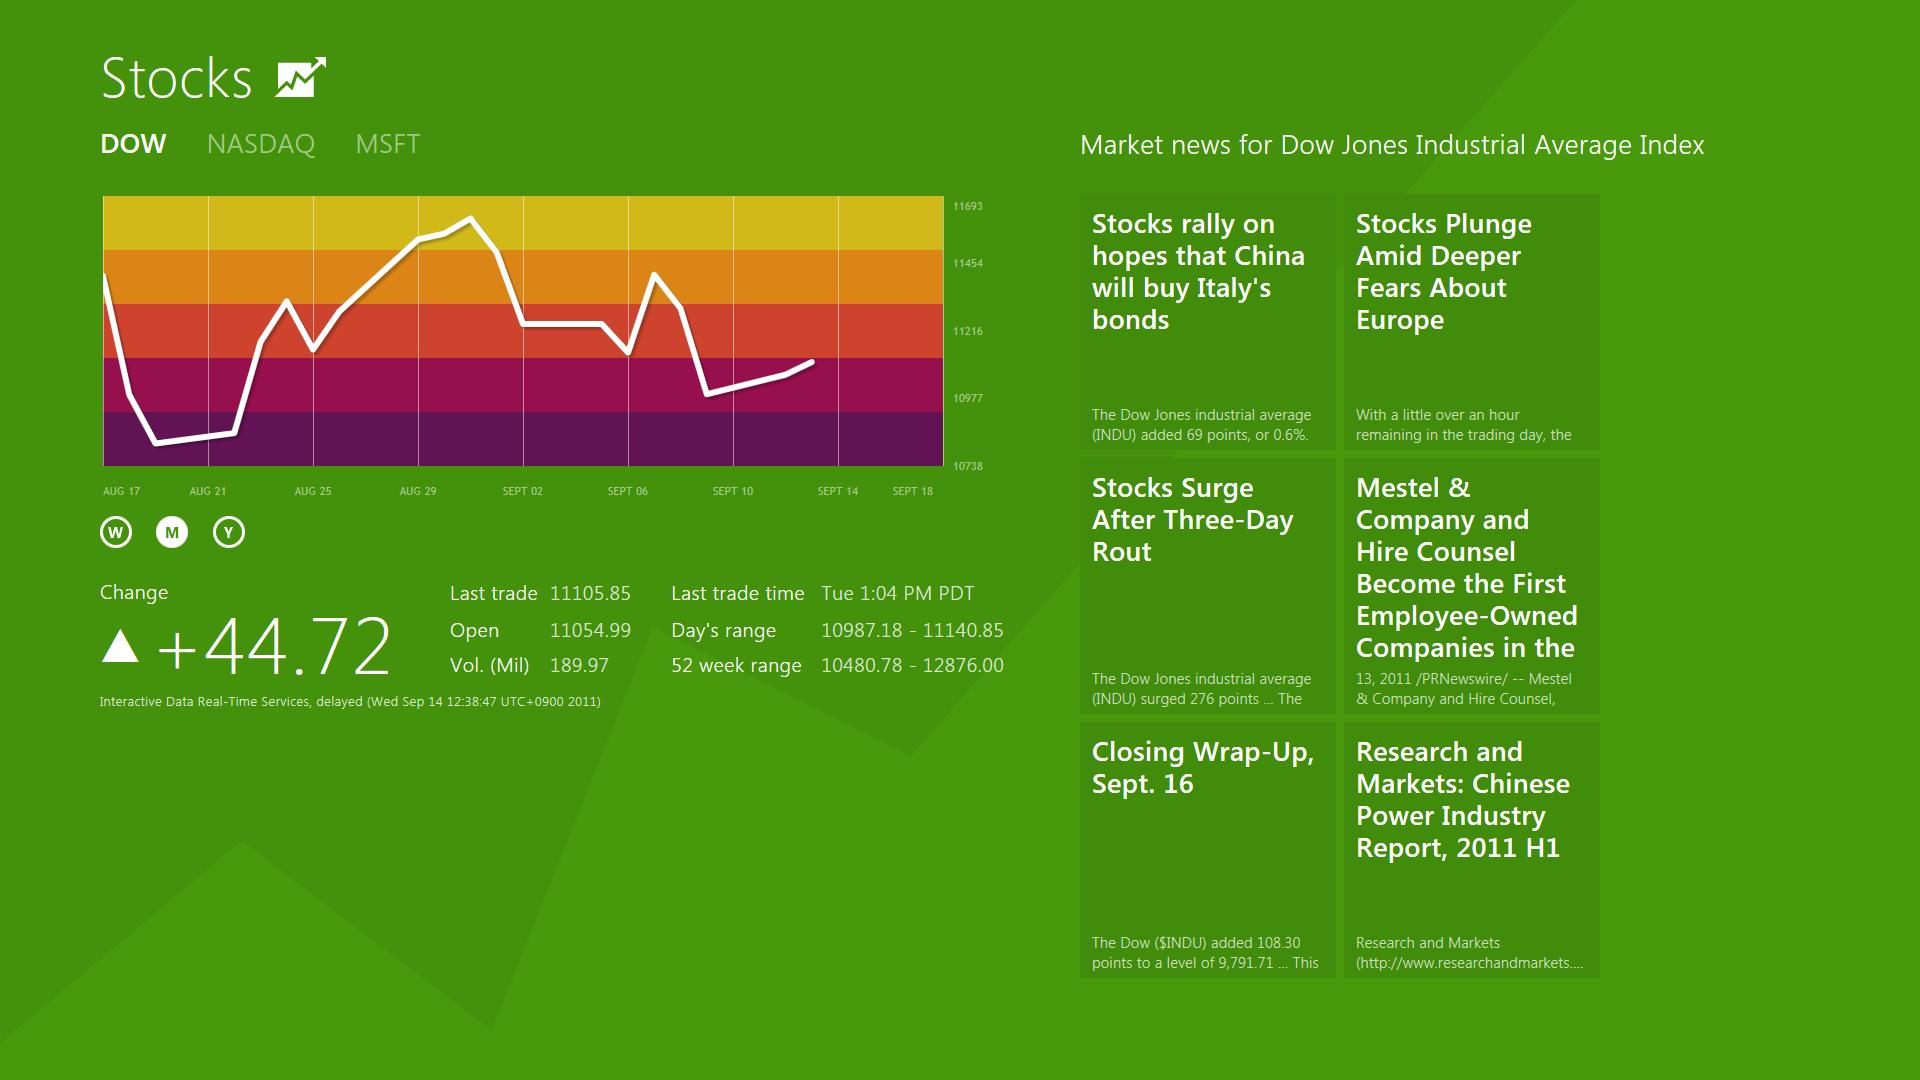 power industry report